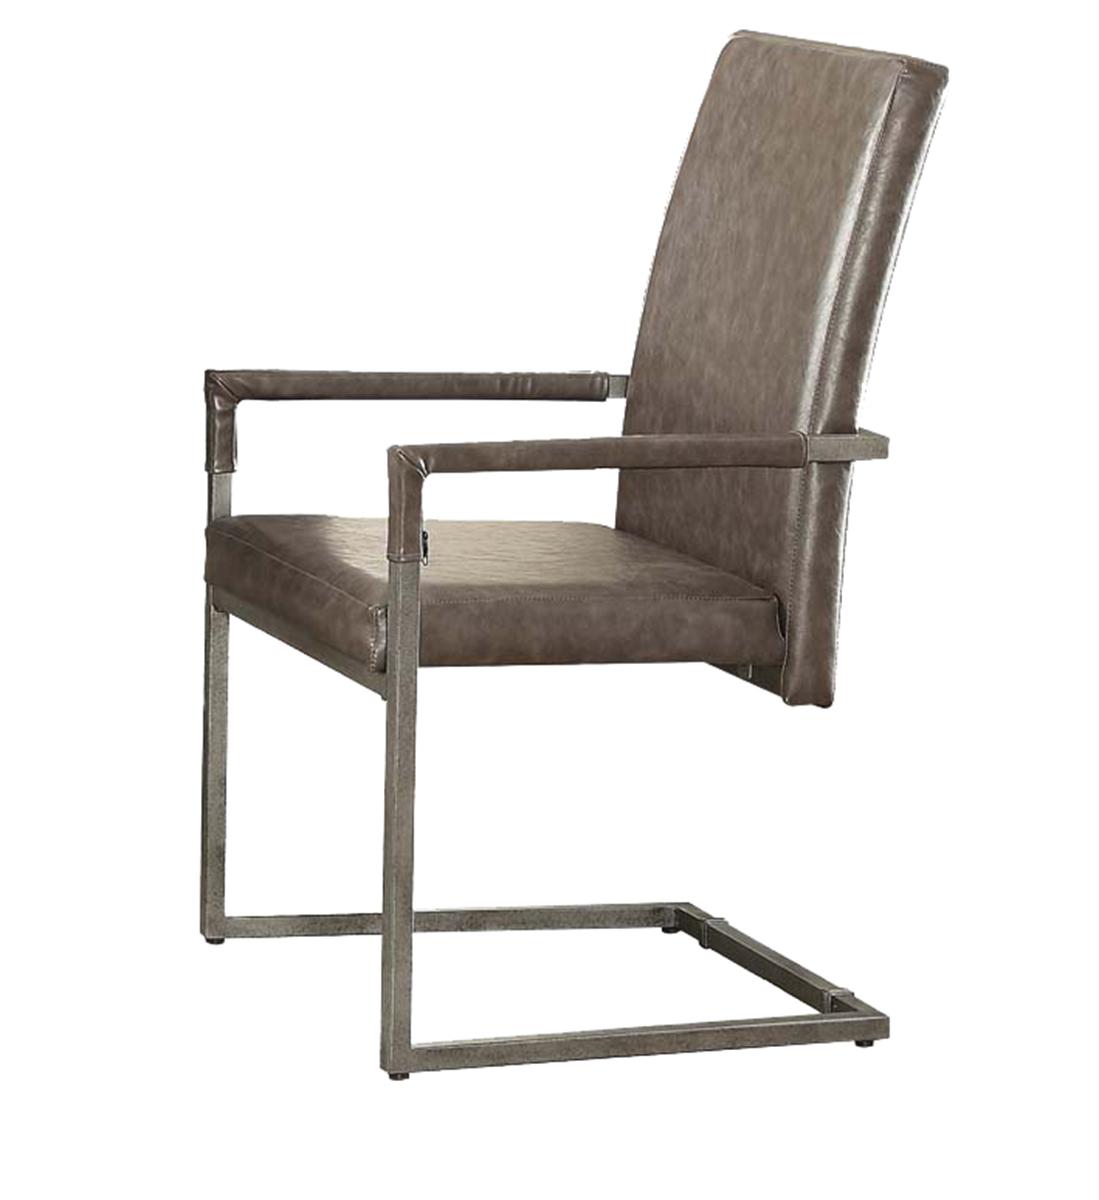 Acme Lazarus Arm Chair - Vintage Gray Vinyl/Antique Silver